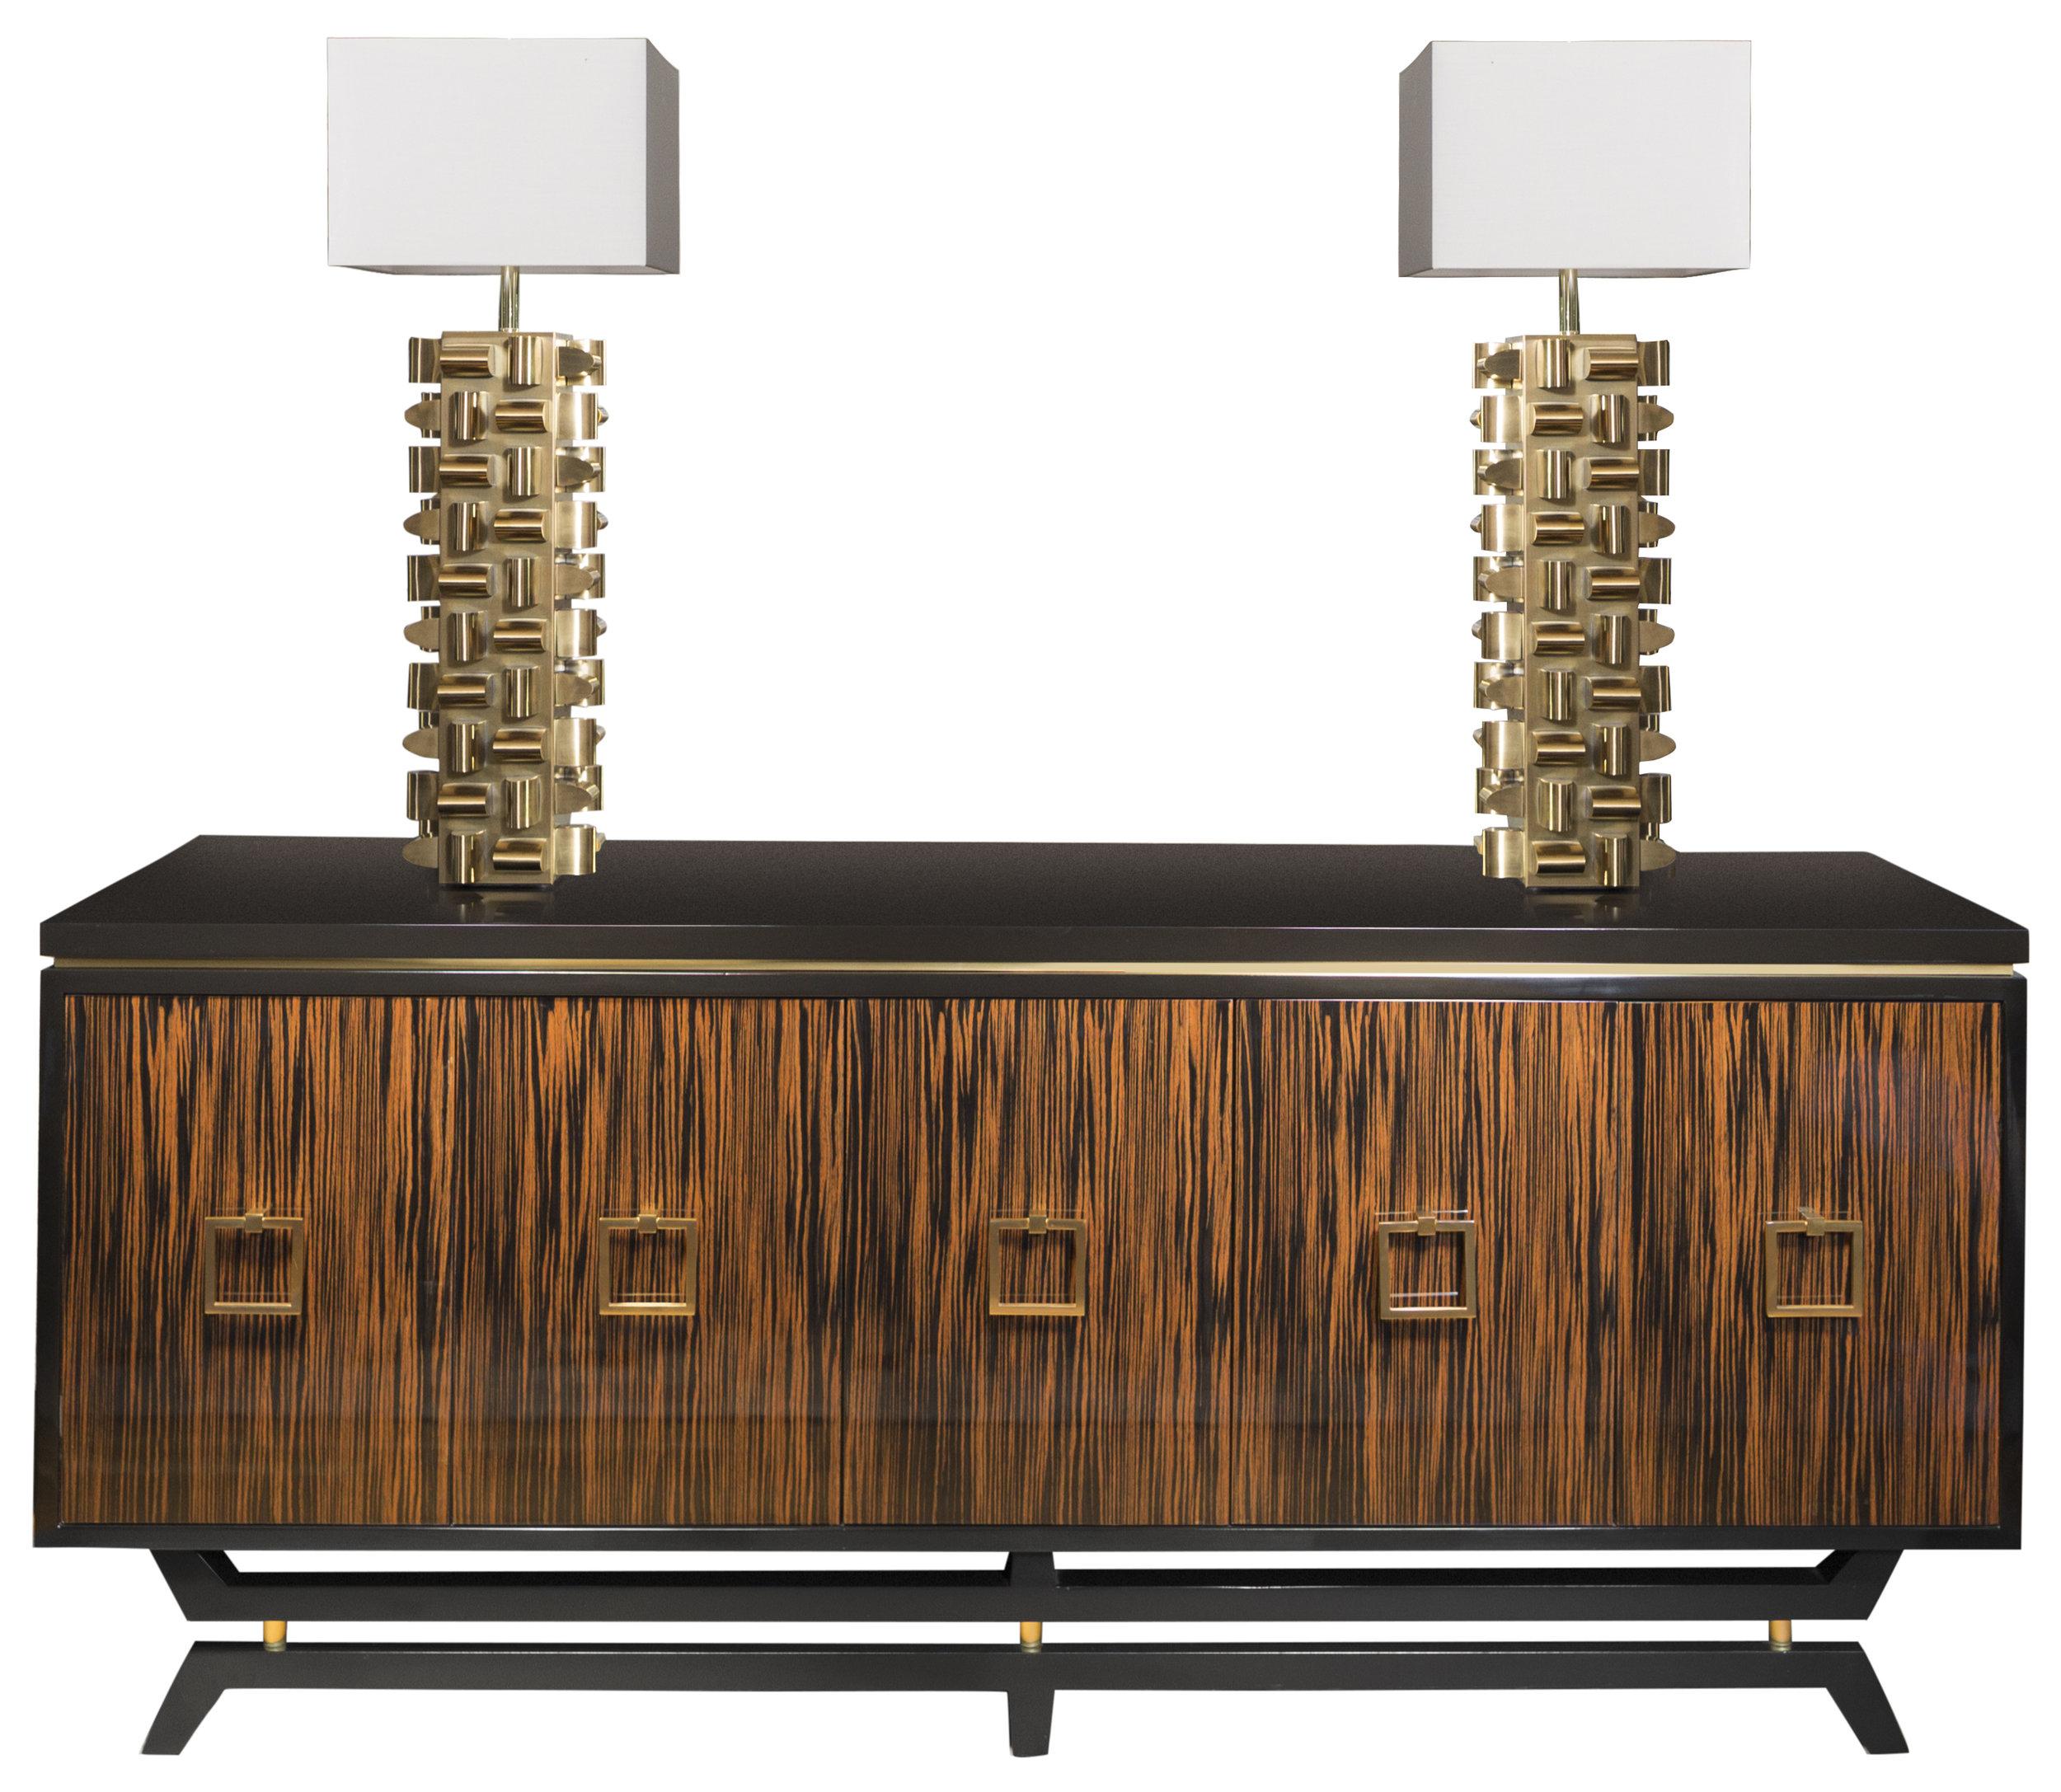 Custom Furniture-6858.jpg